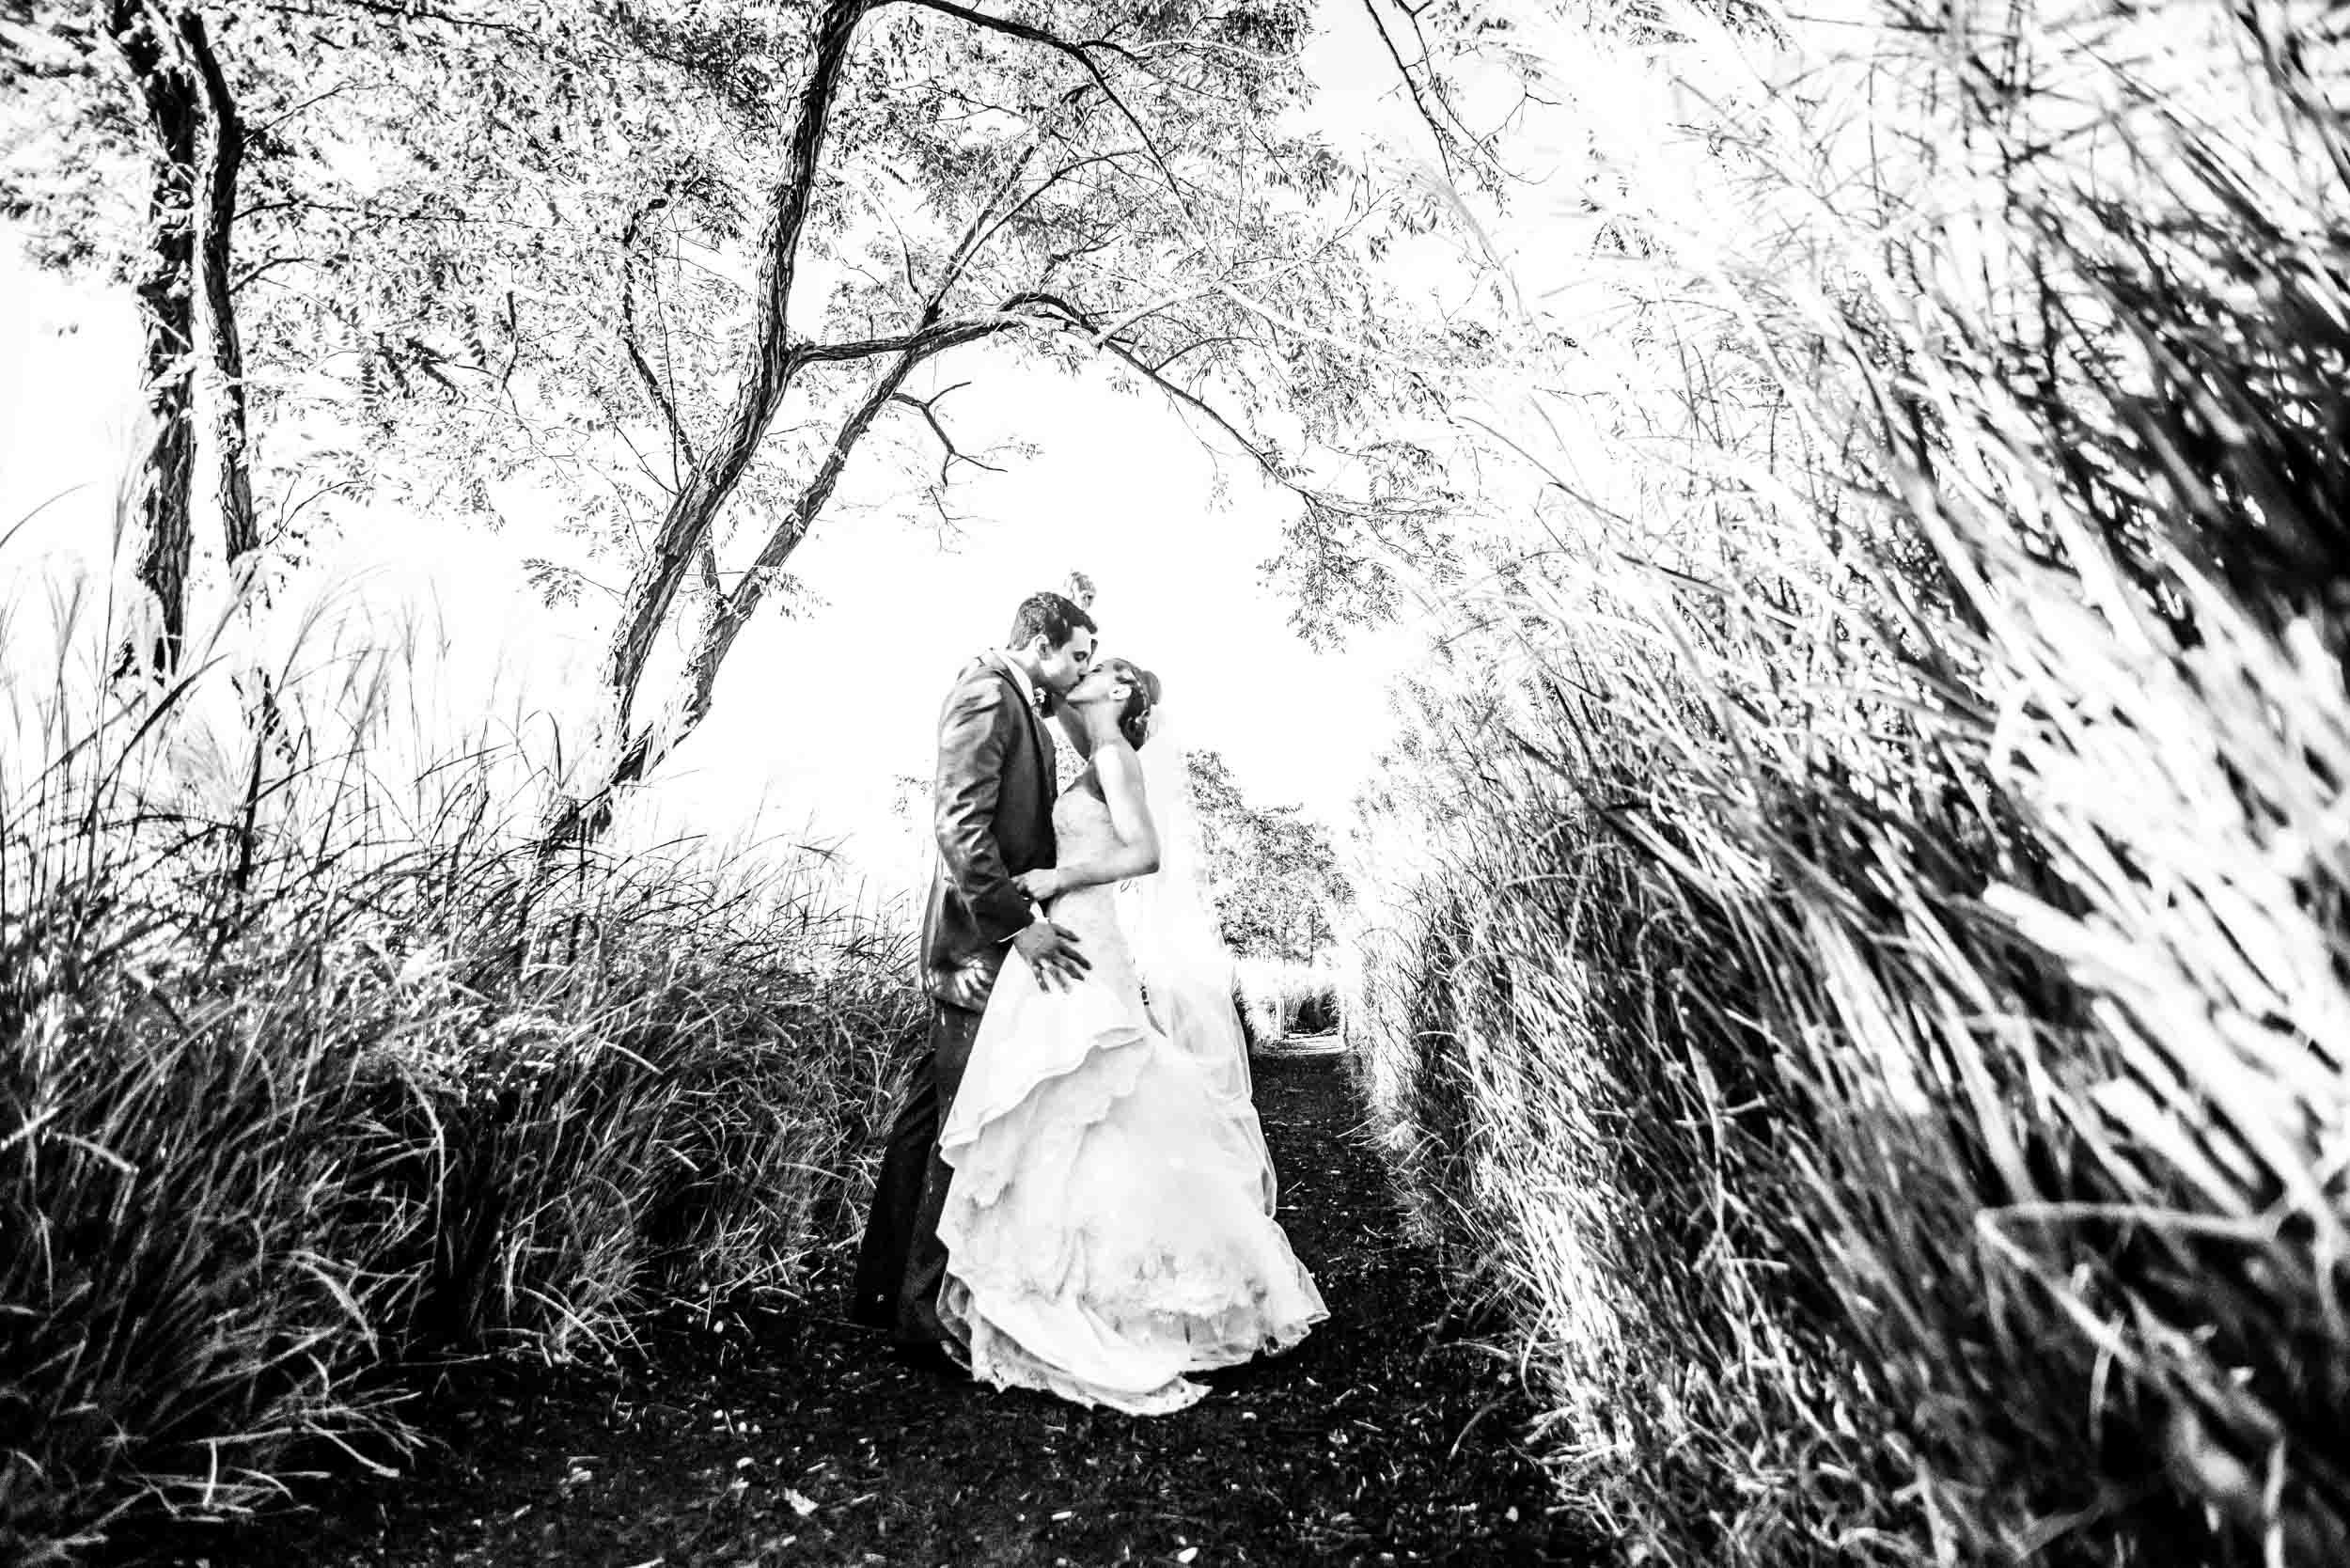 dc+metro+wedding+photographer+vadym+guliuk+photography+wedding+bride+and+groom-2034.jpg